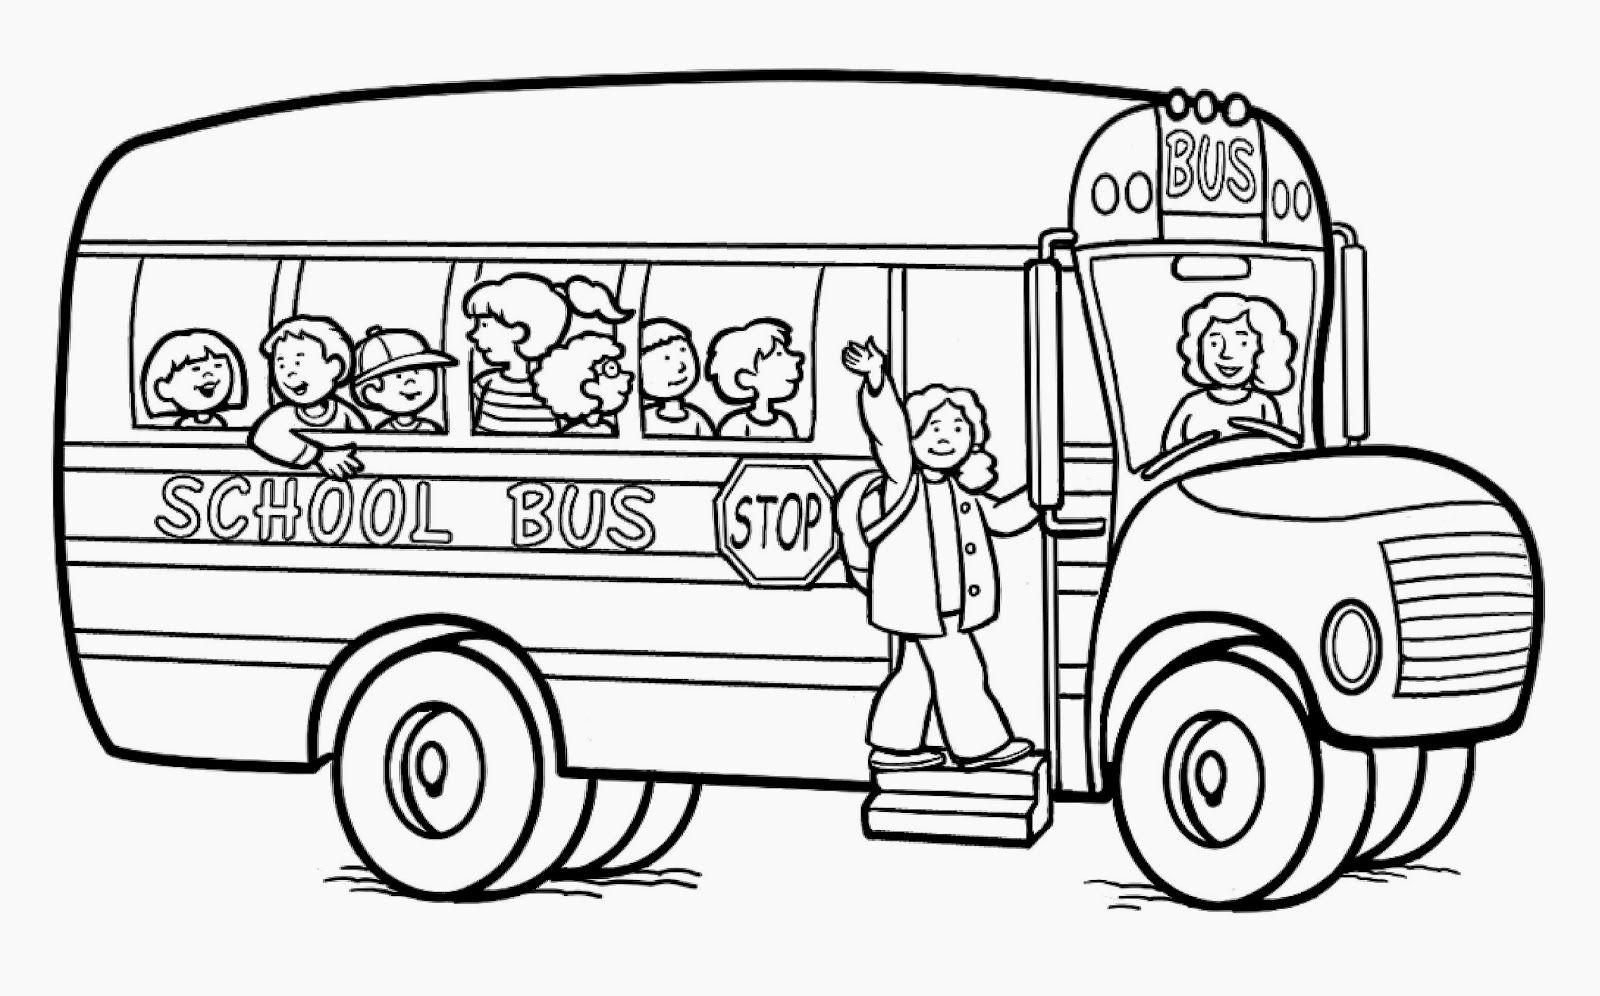 1600x996 Top School Bus Coloring Pages For Preschool